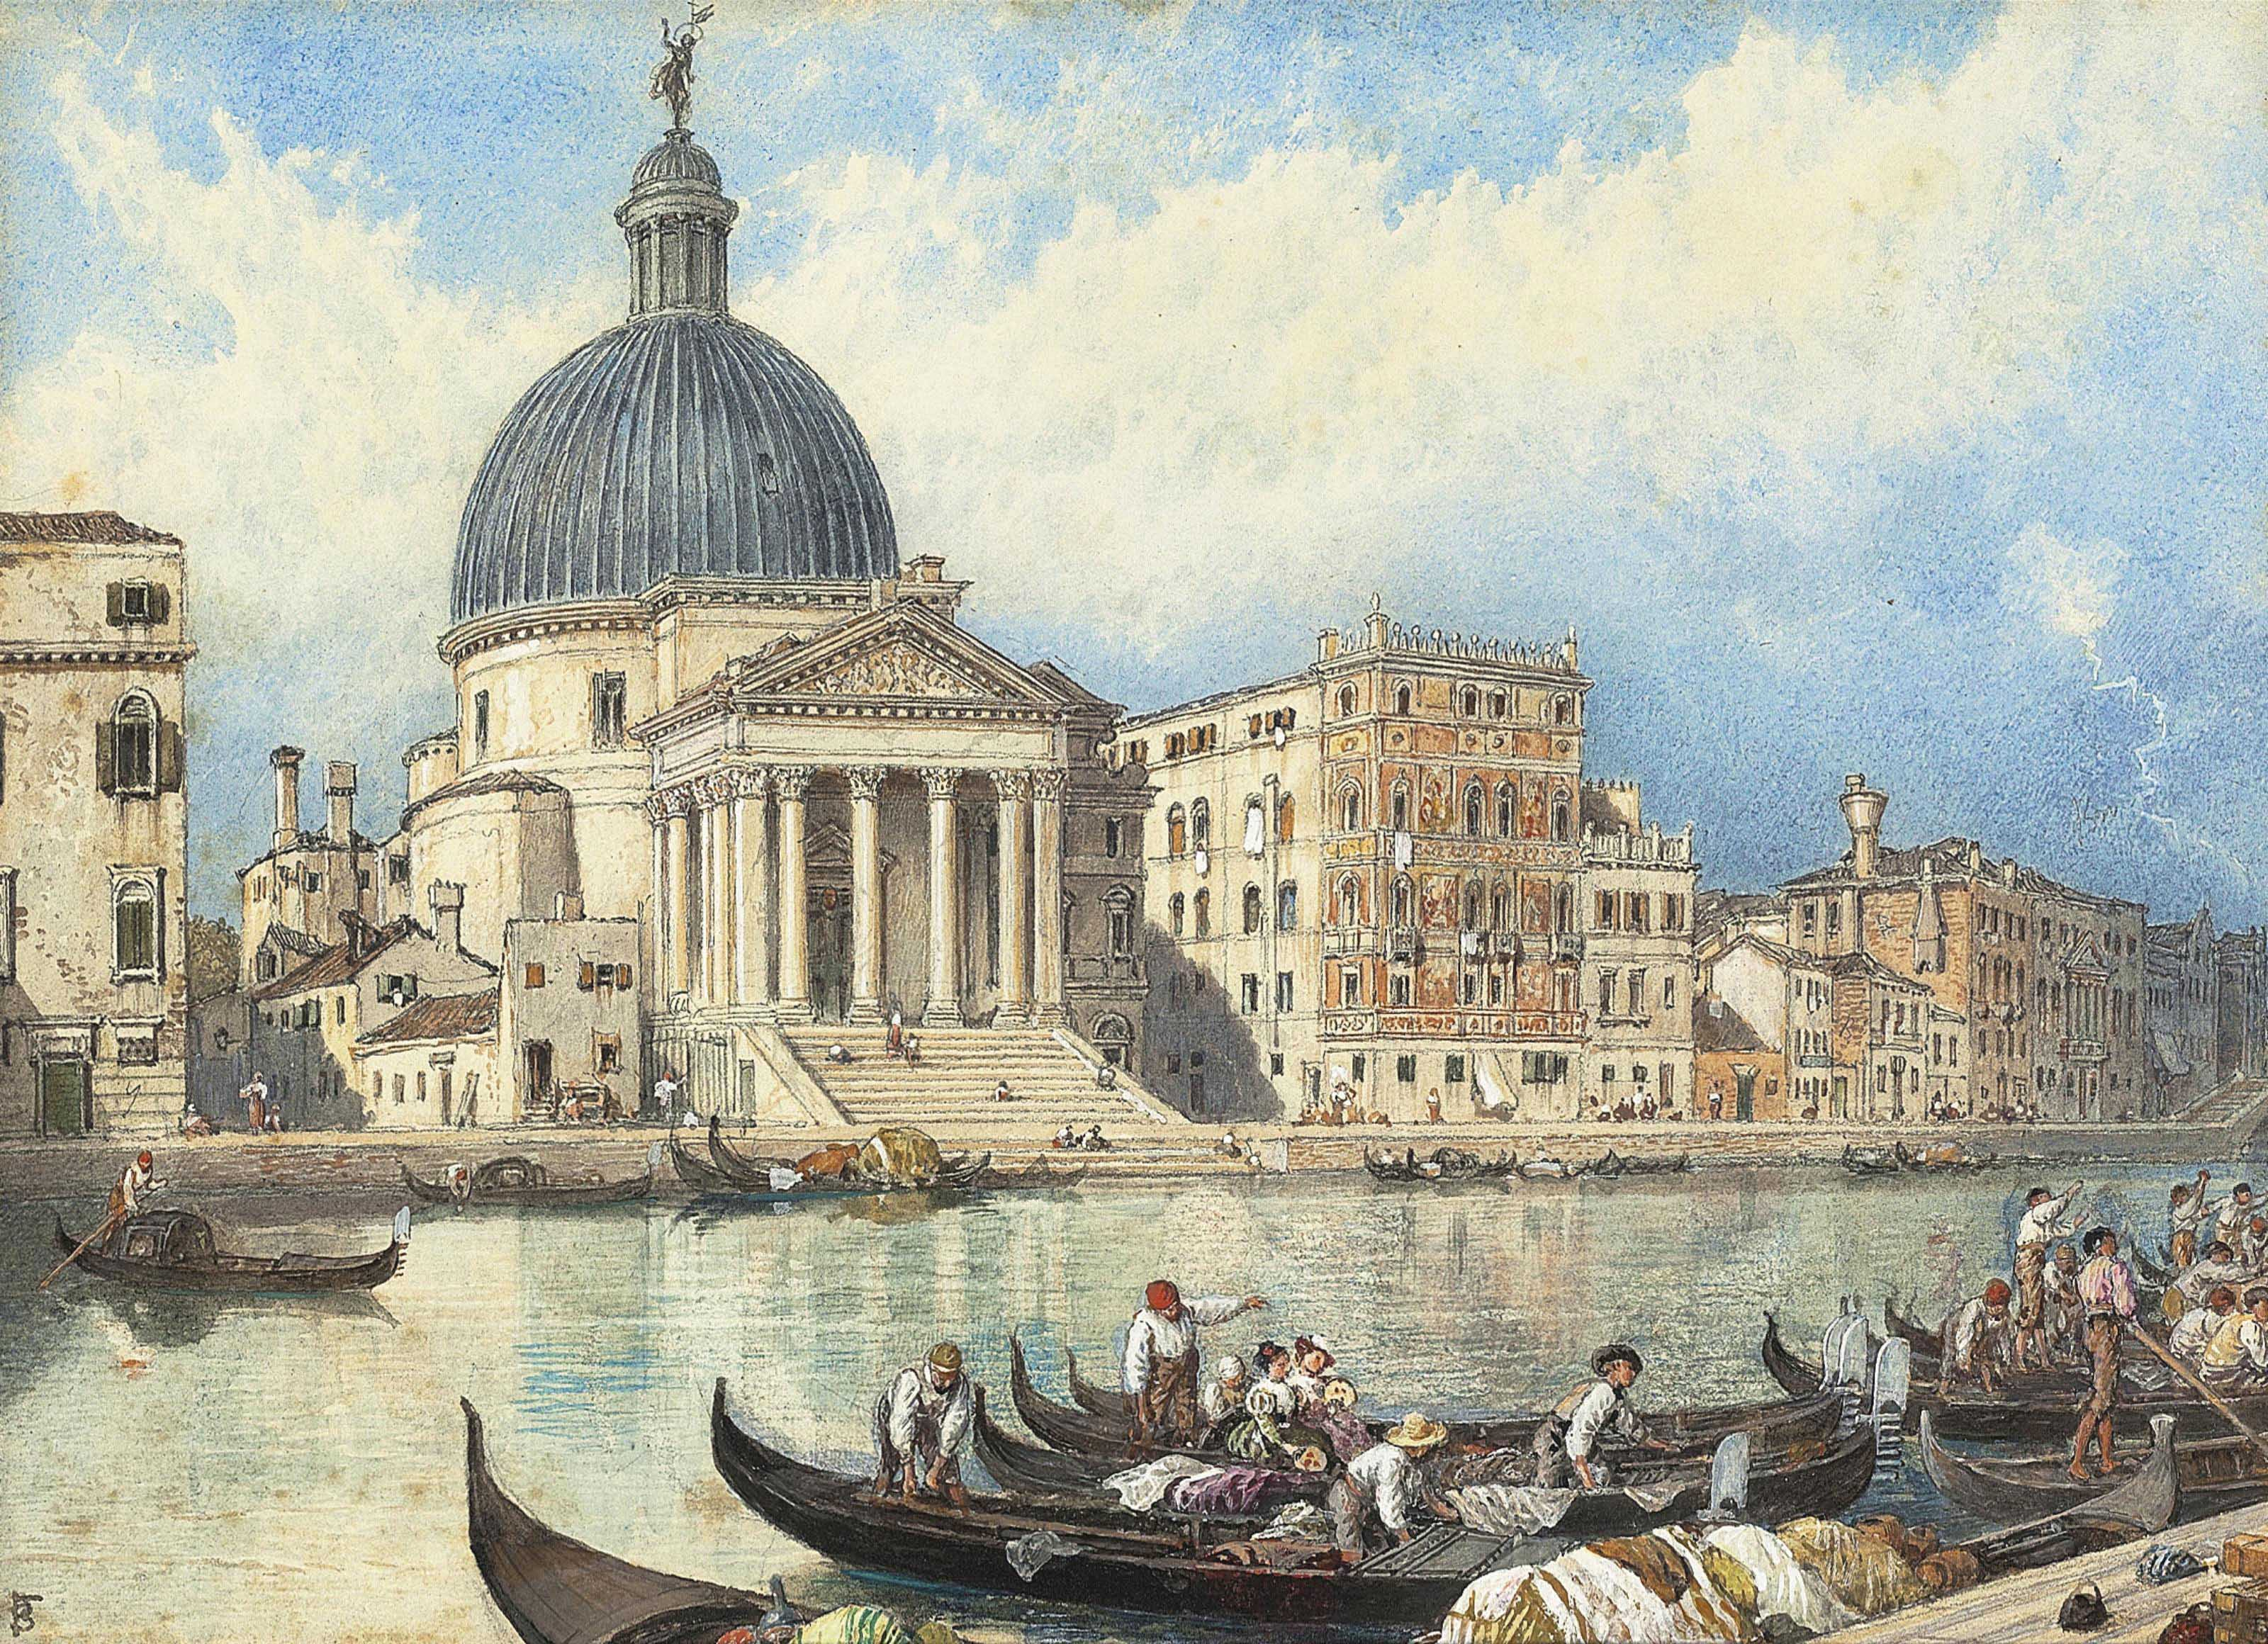 The Church of San Simone and San Judi, Venice: The arrival of a train